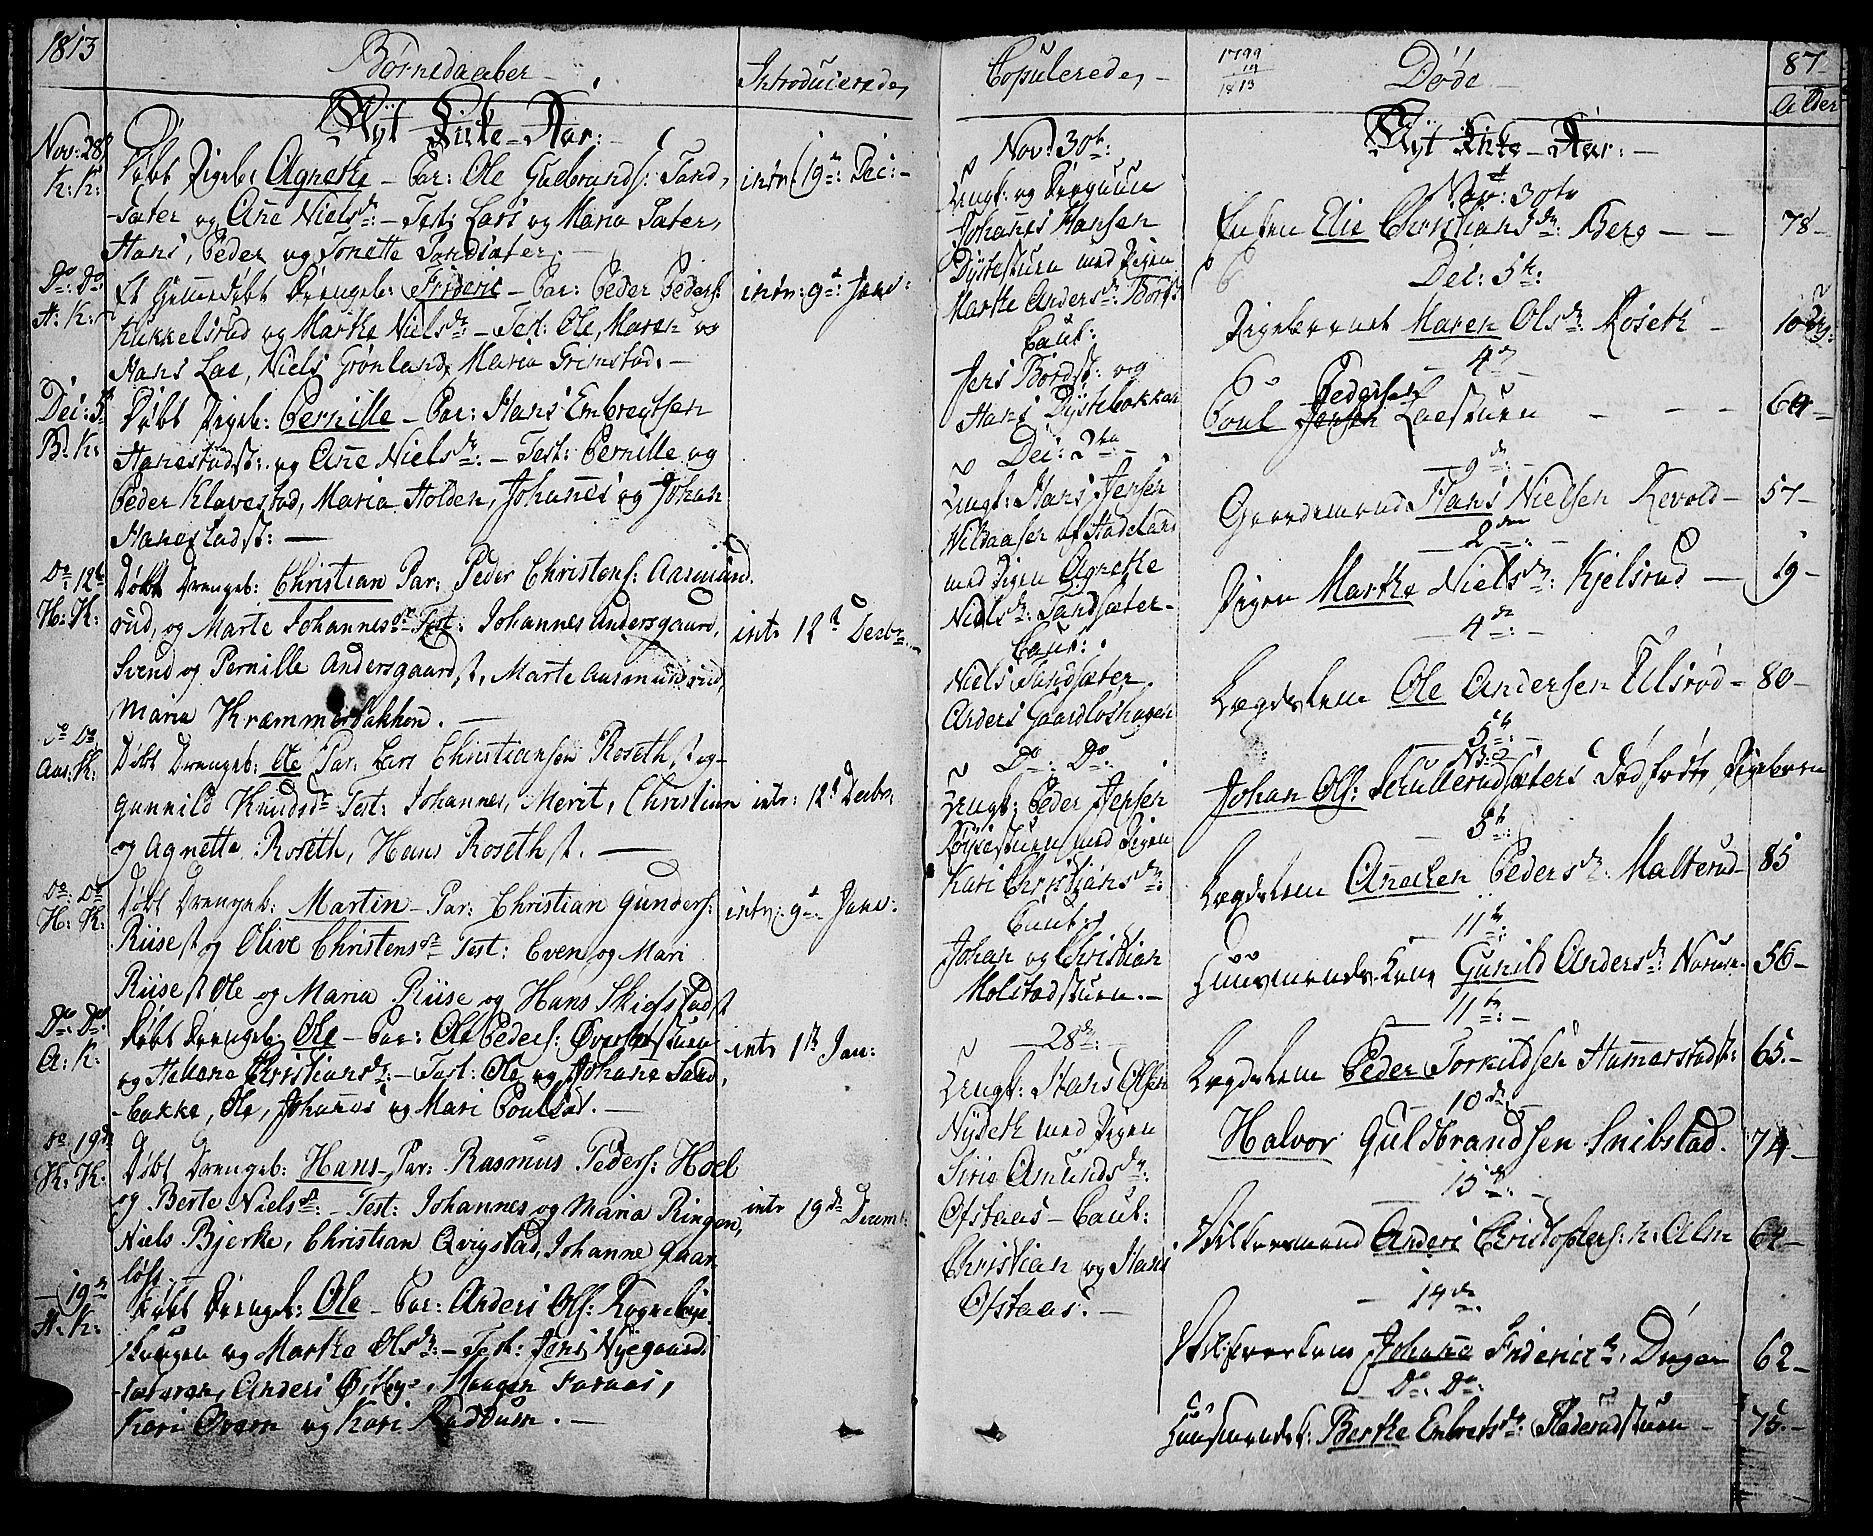 SAH, Toten prestekontor, Ministerialbok nr. 8, 1809-1814, s. 87